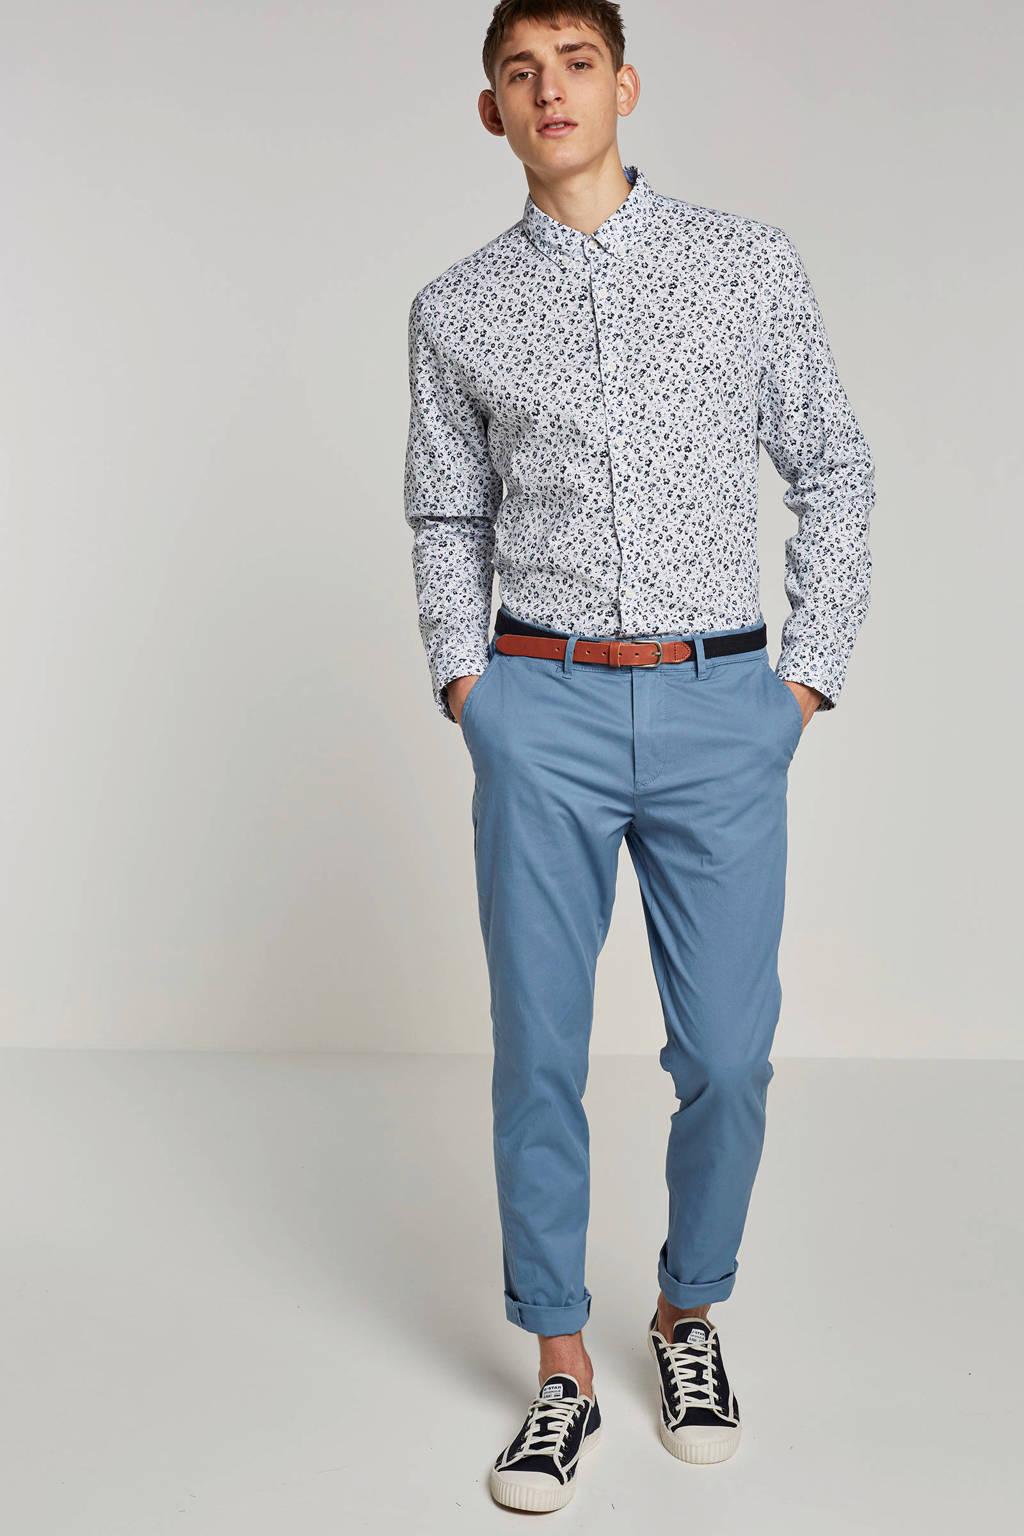 ESPRIT Men Casual regular fit overhemd, Wit